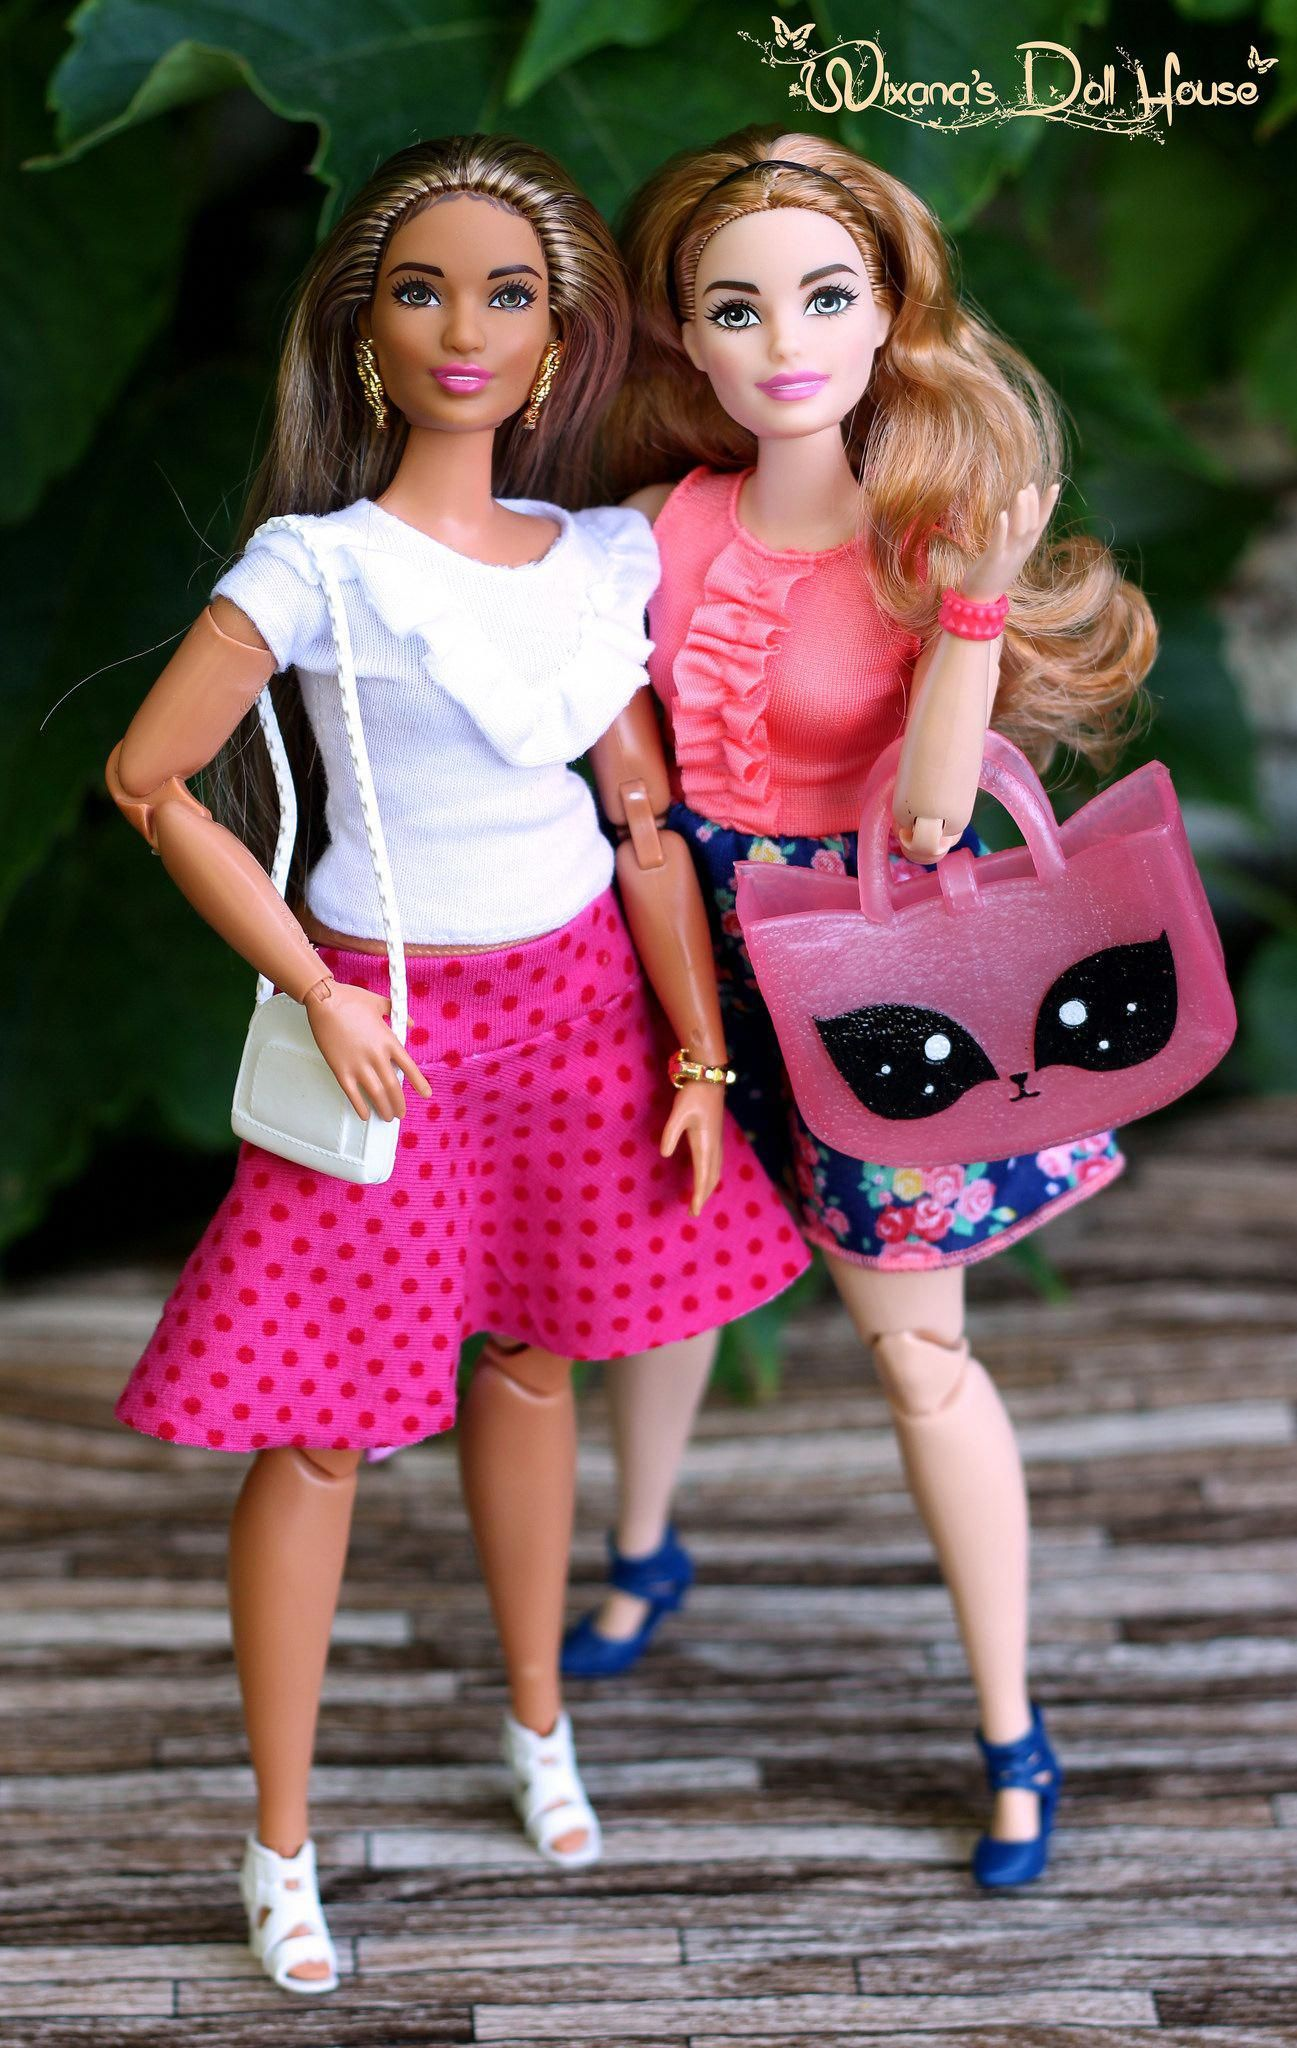 Curvy Made To Move Barbie Barbie Fashionista Vintage Barbie Dolls Barbie Clothes